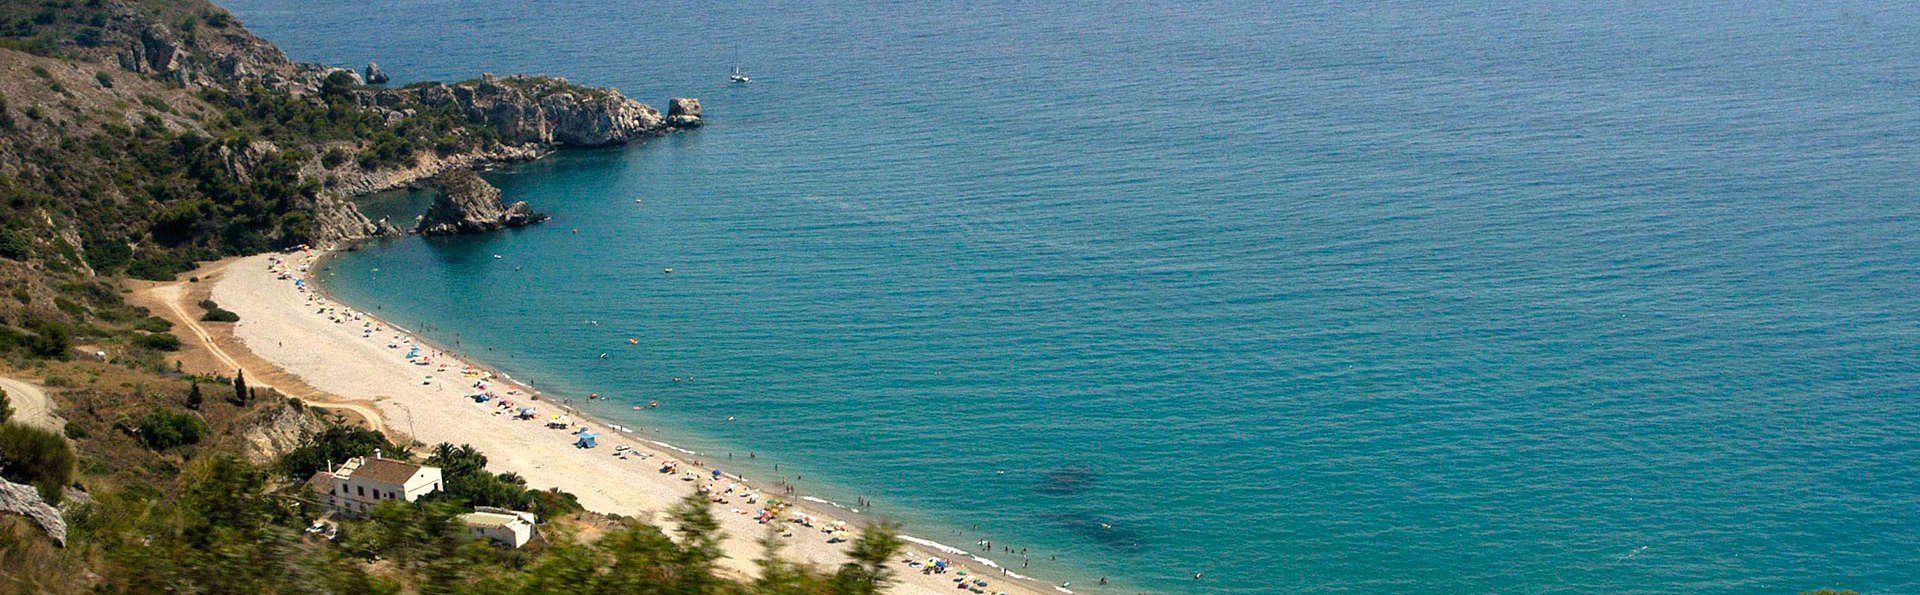 Hotel Albayzin del Mar - EDIT_ALMunecar1.jpg